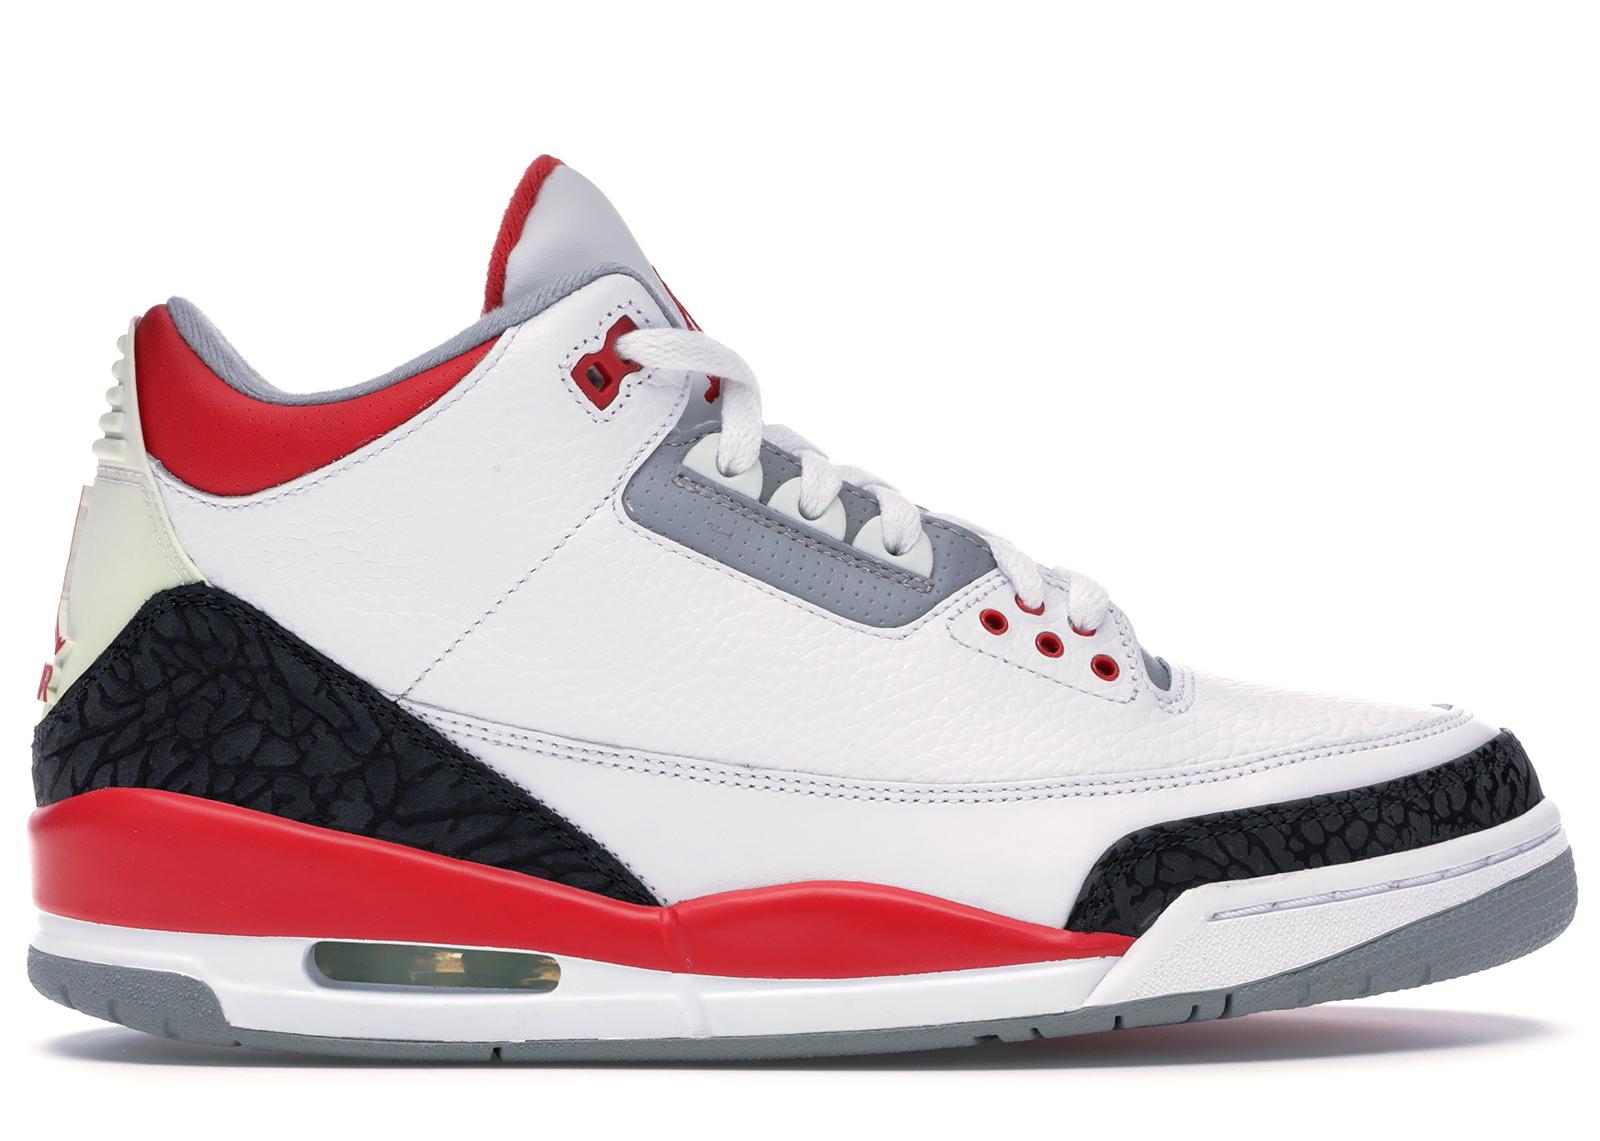 Jordan 3 Retro Fire Red (2007) - 136064-161